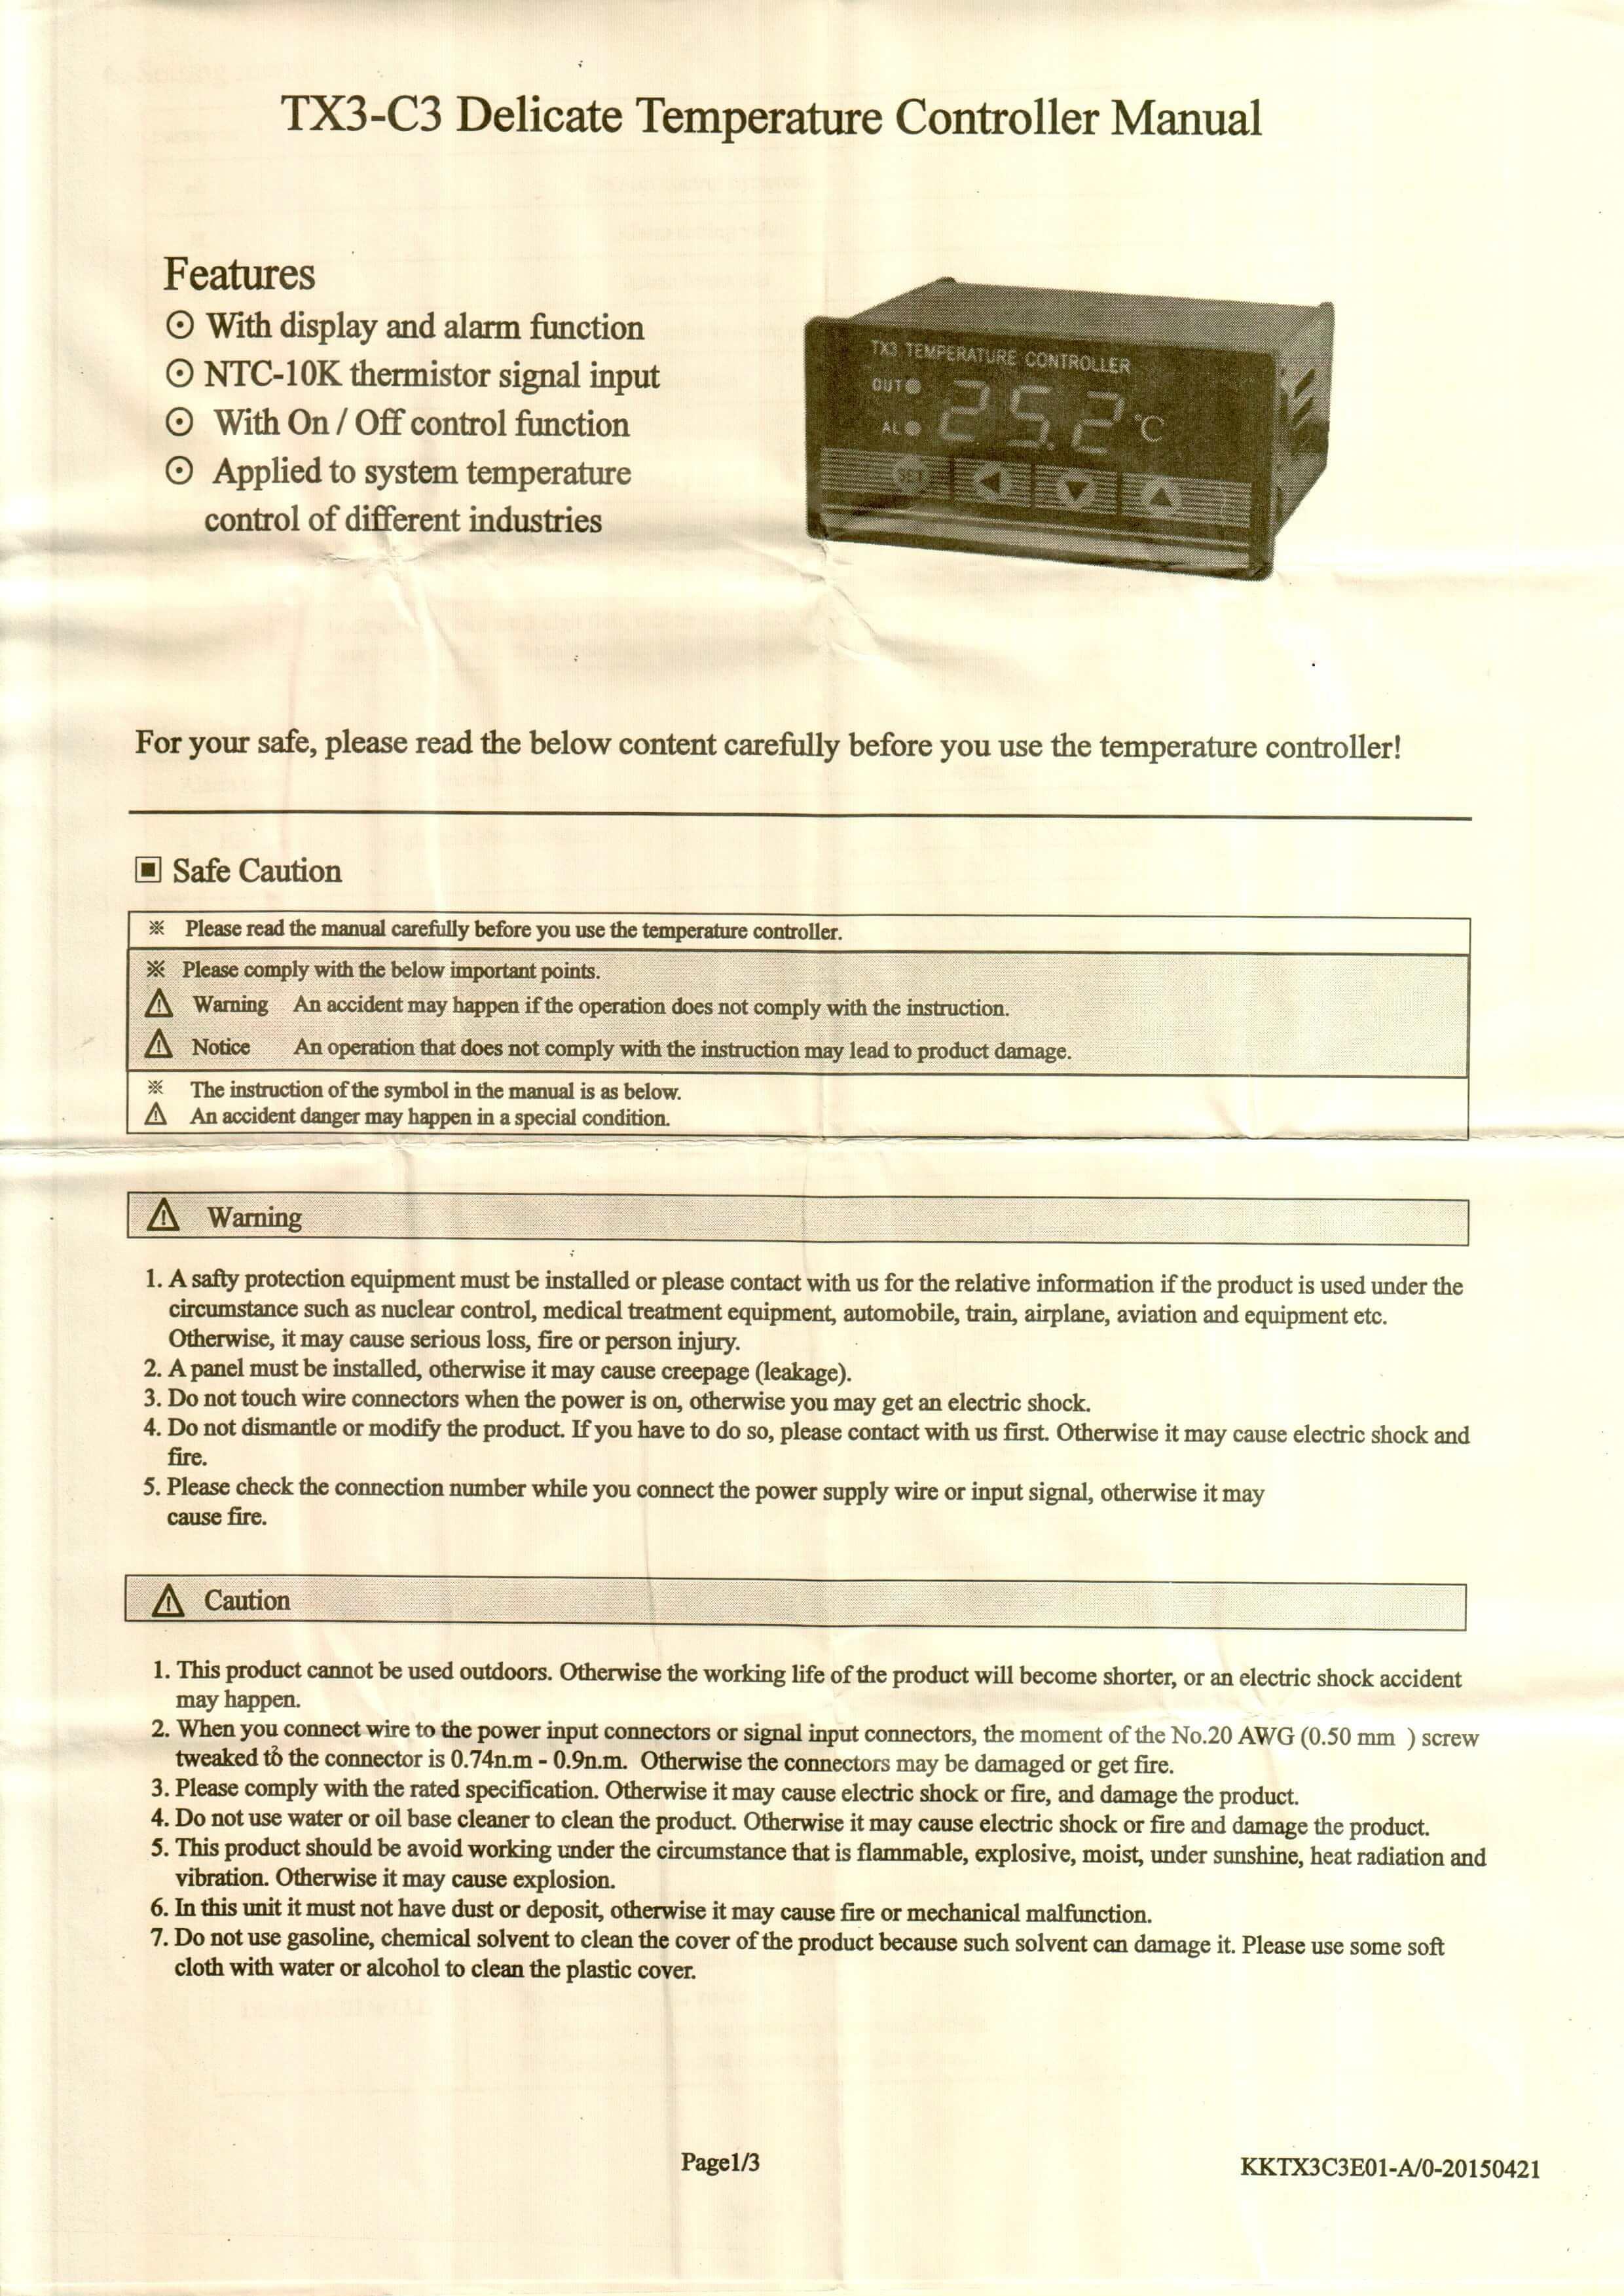 TX3 INFO 1 - کنترلر دما توکی Toky مدل TX3-C3